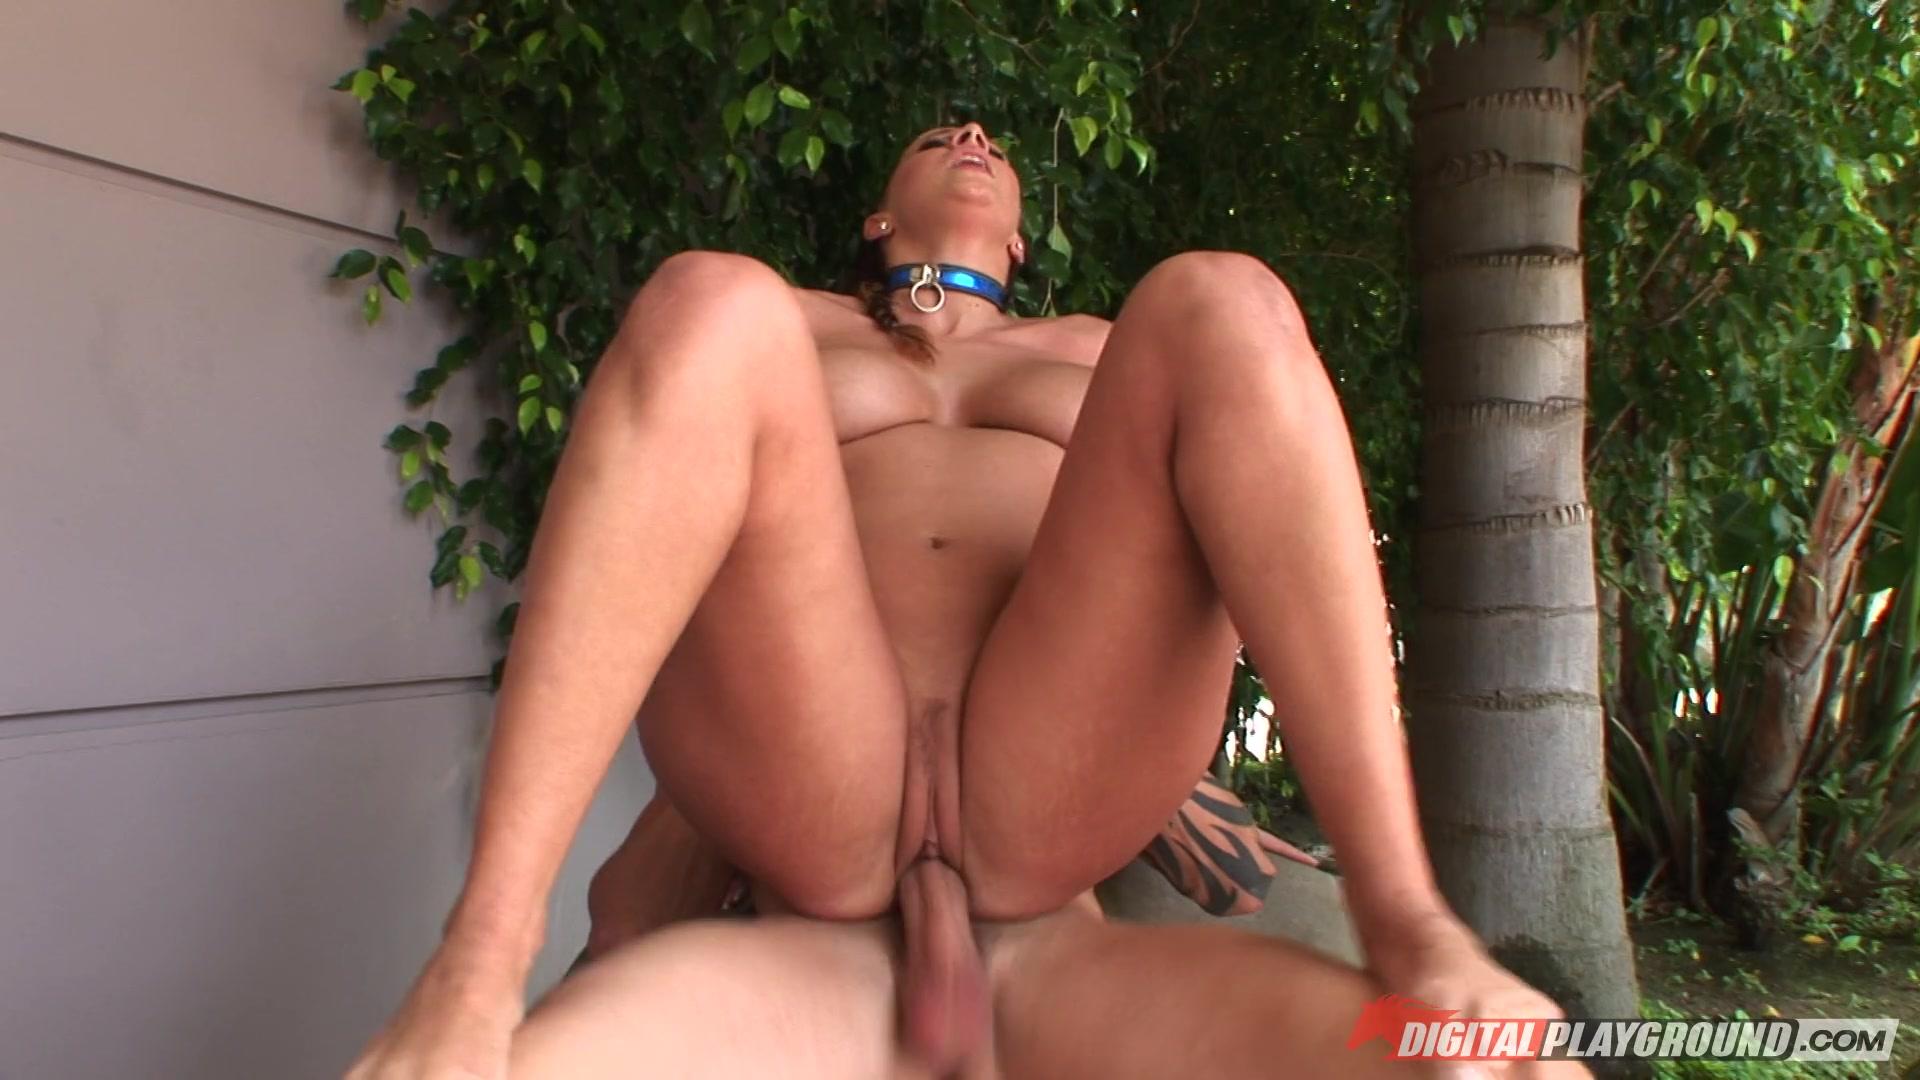 Hot exotic babe wraps her pretty lips around a massive black cock 2